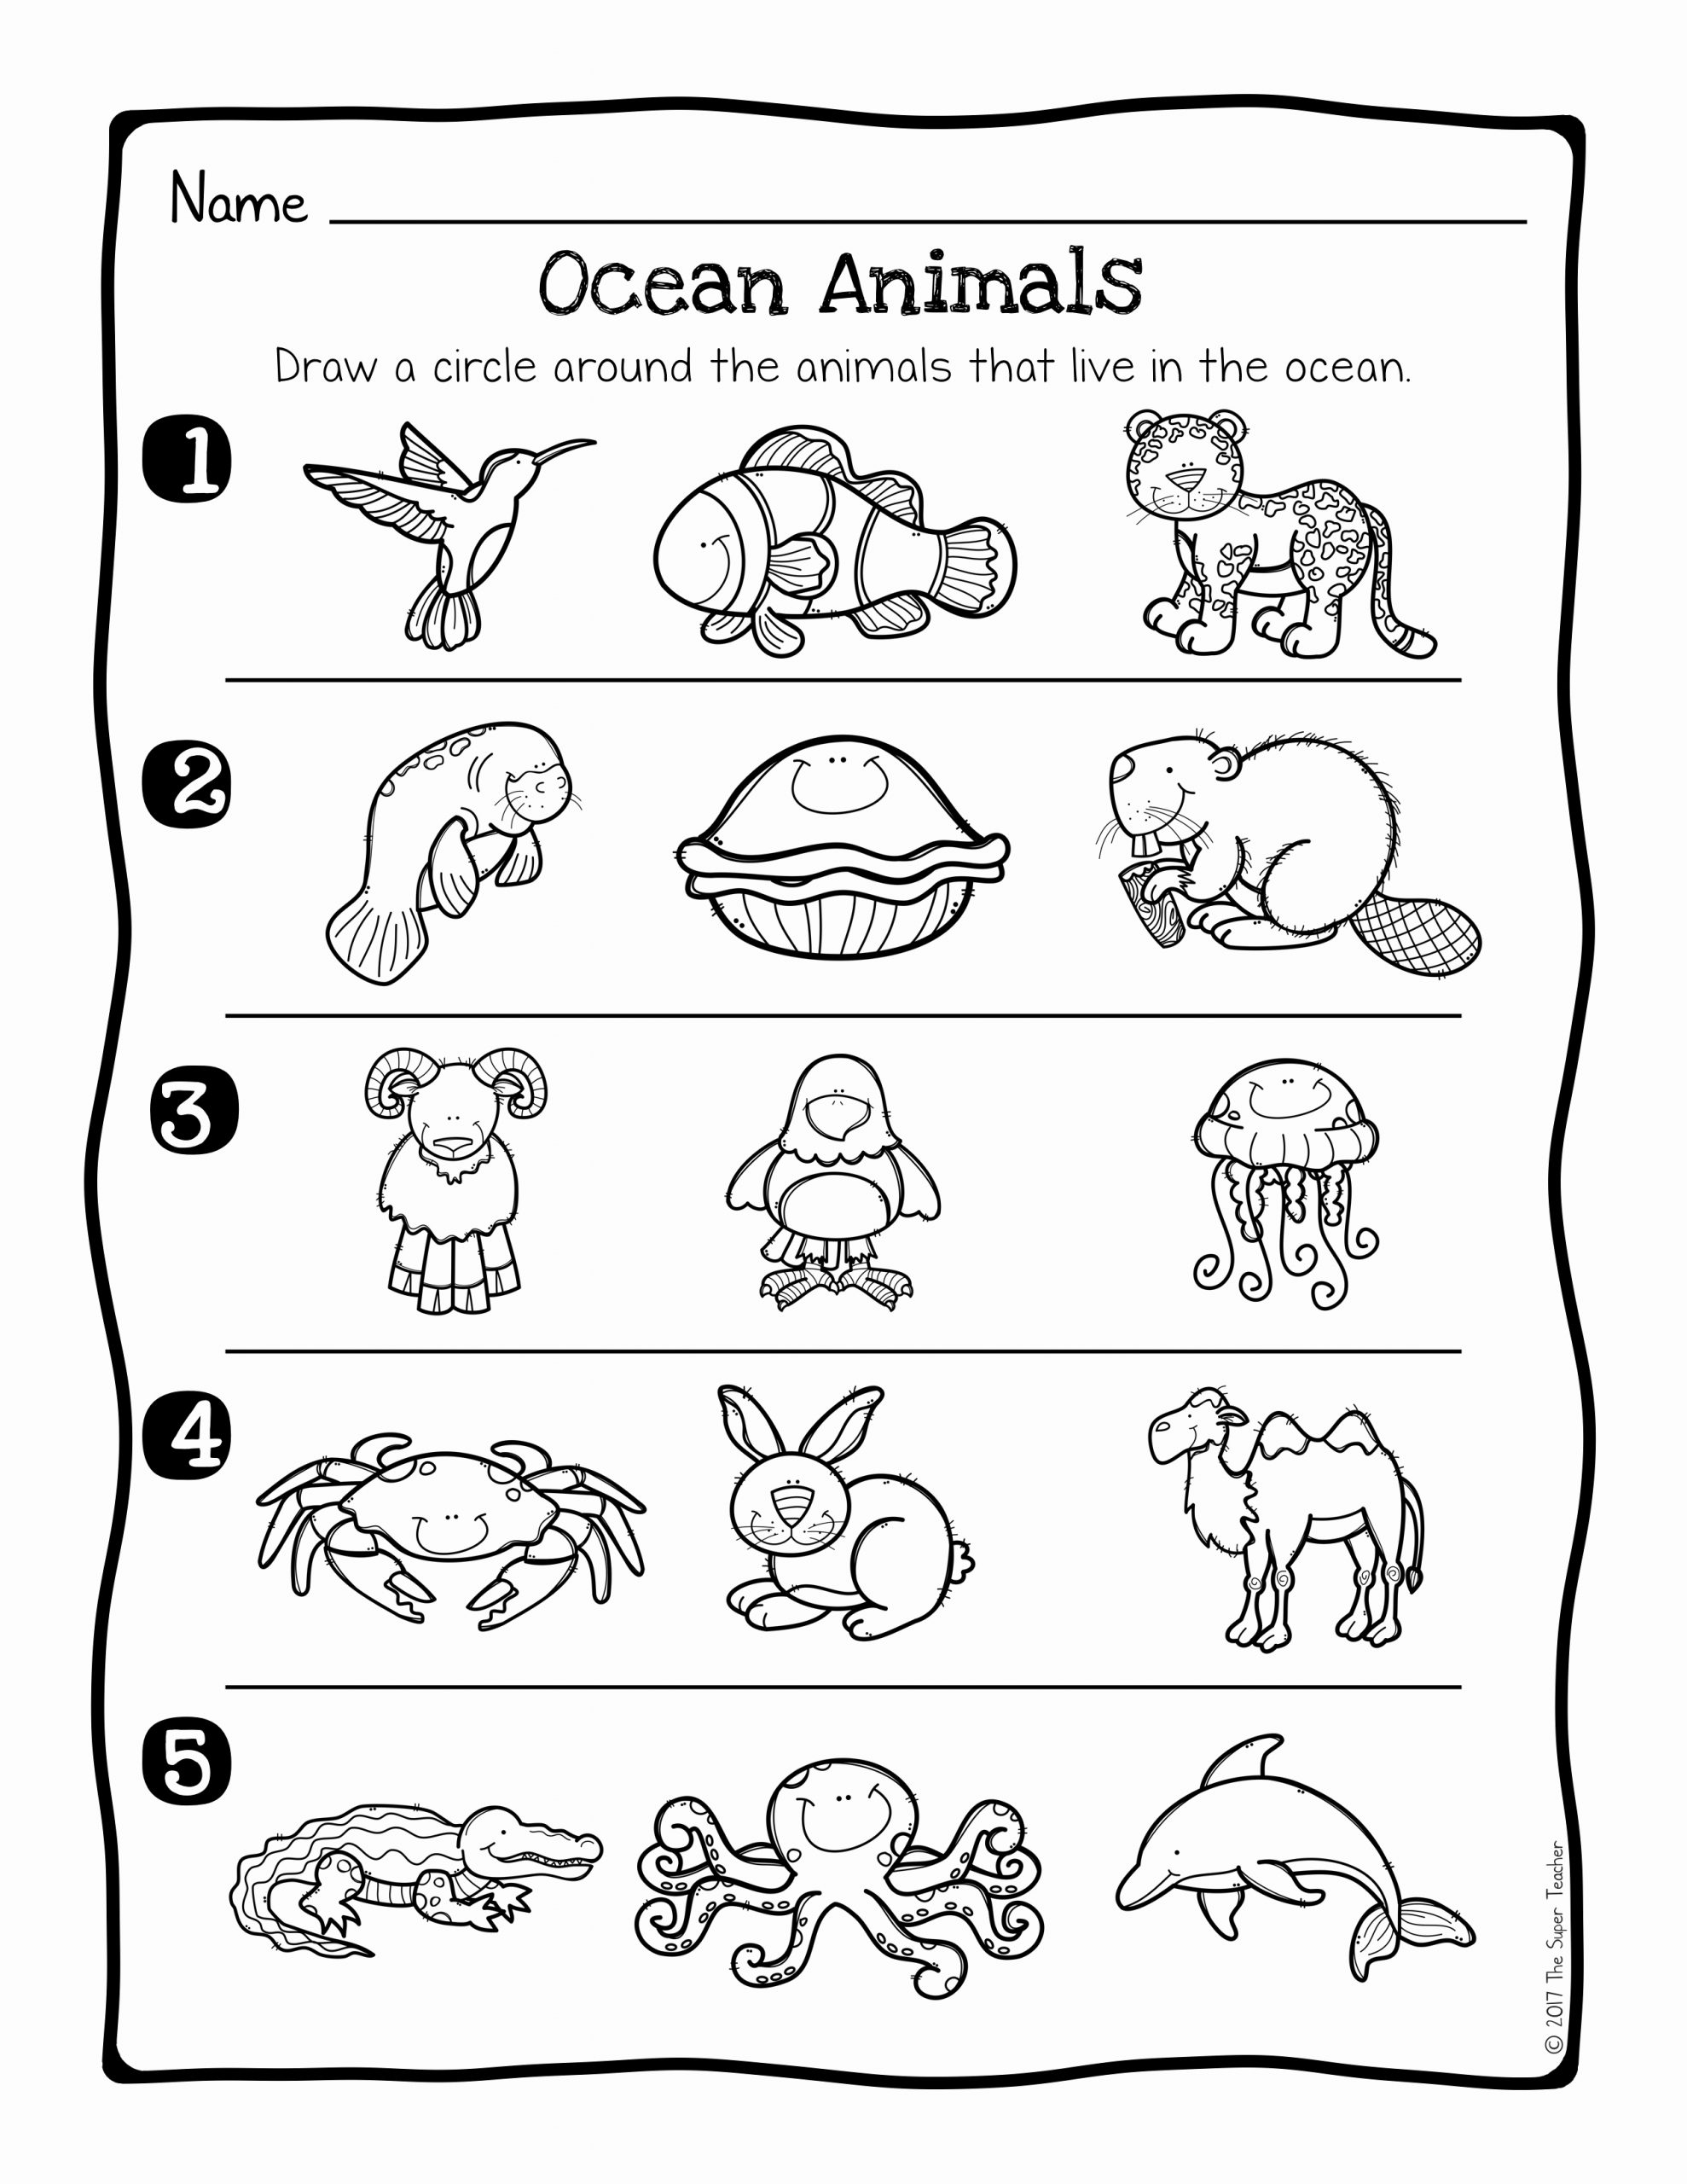 Free Habitat Worksheets Luxury Animal Habitats Science Activity and Worksheets the